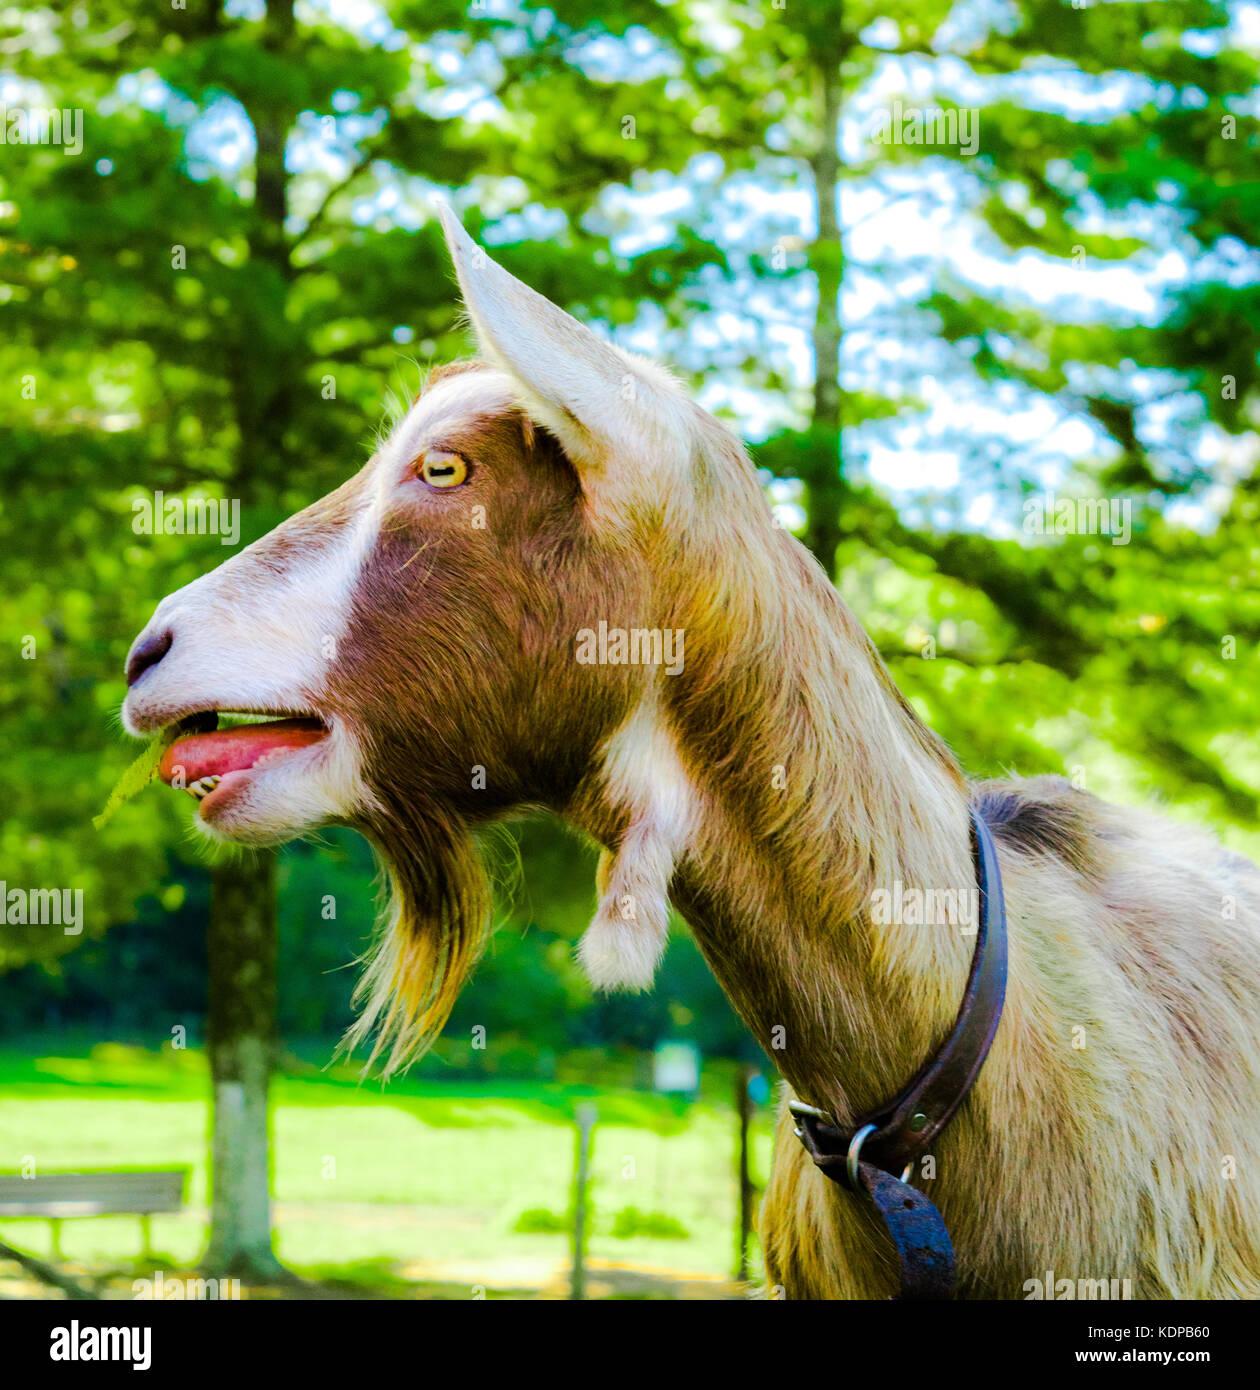 Swedish Mountain Goats in North Carolina - Stock Image